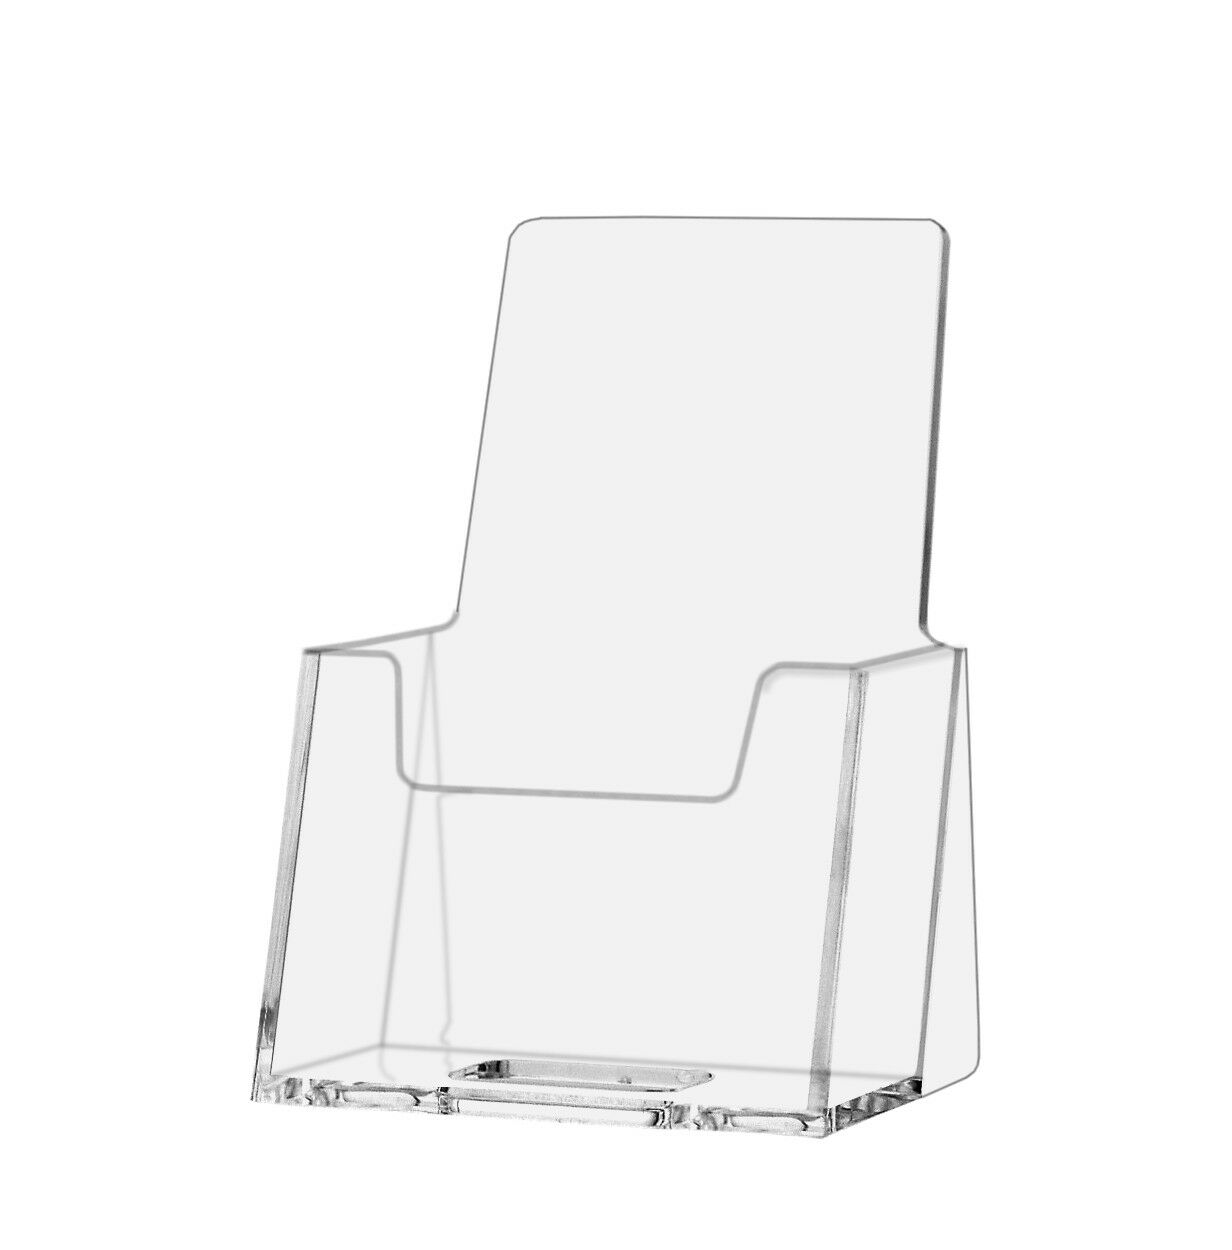 6) Acrylic Vertical Portrait Clear Business Card Holder Wholesale | eBay